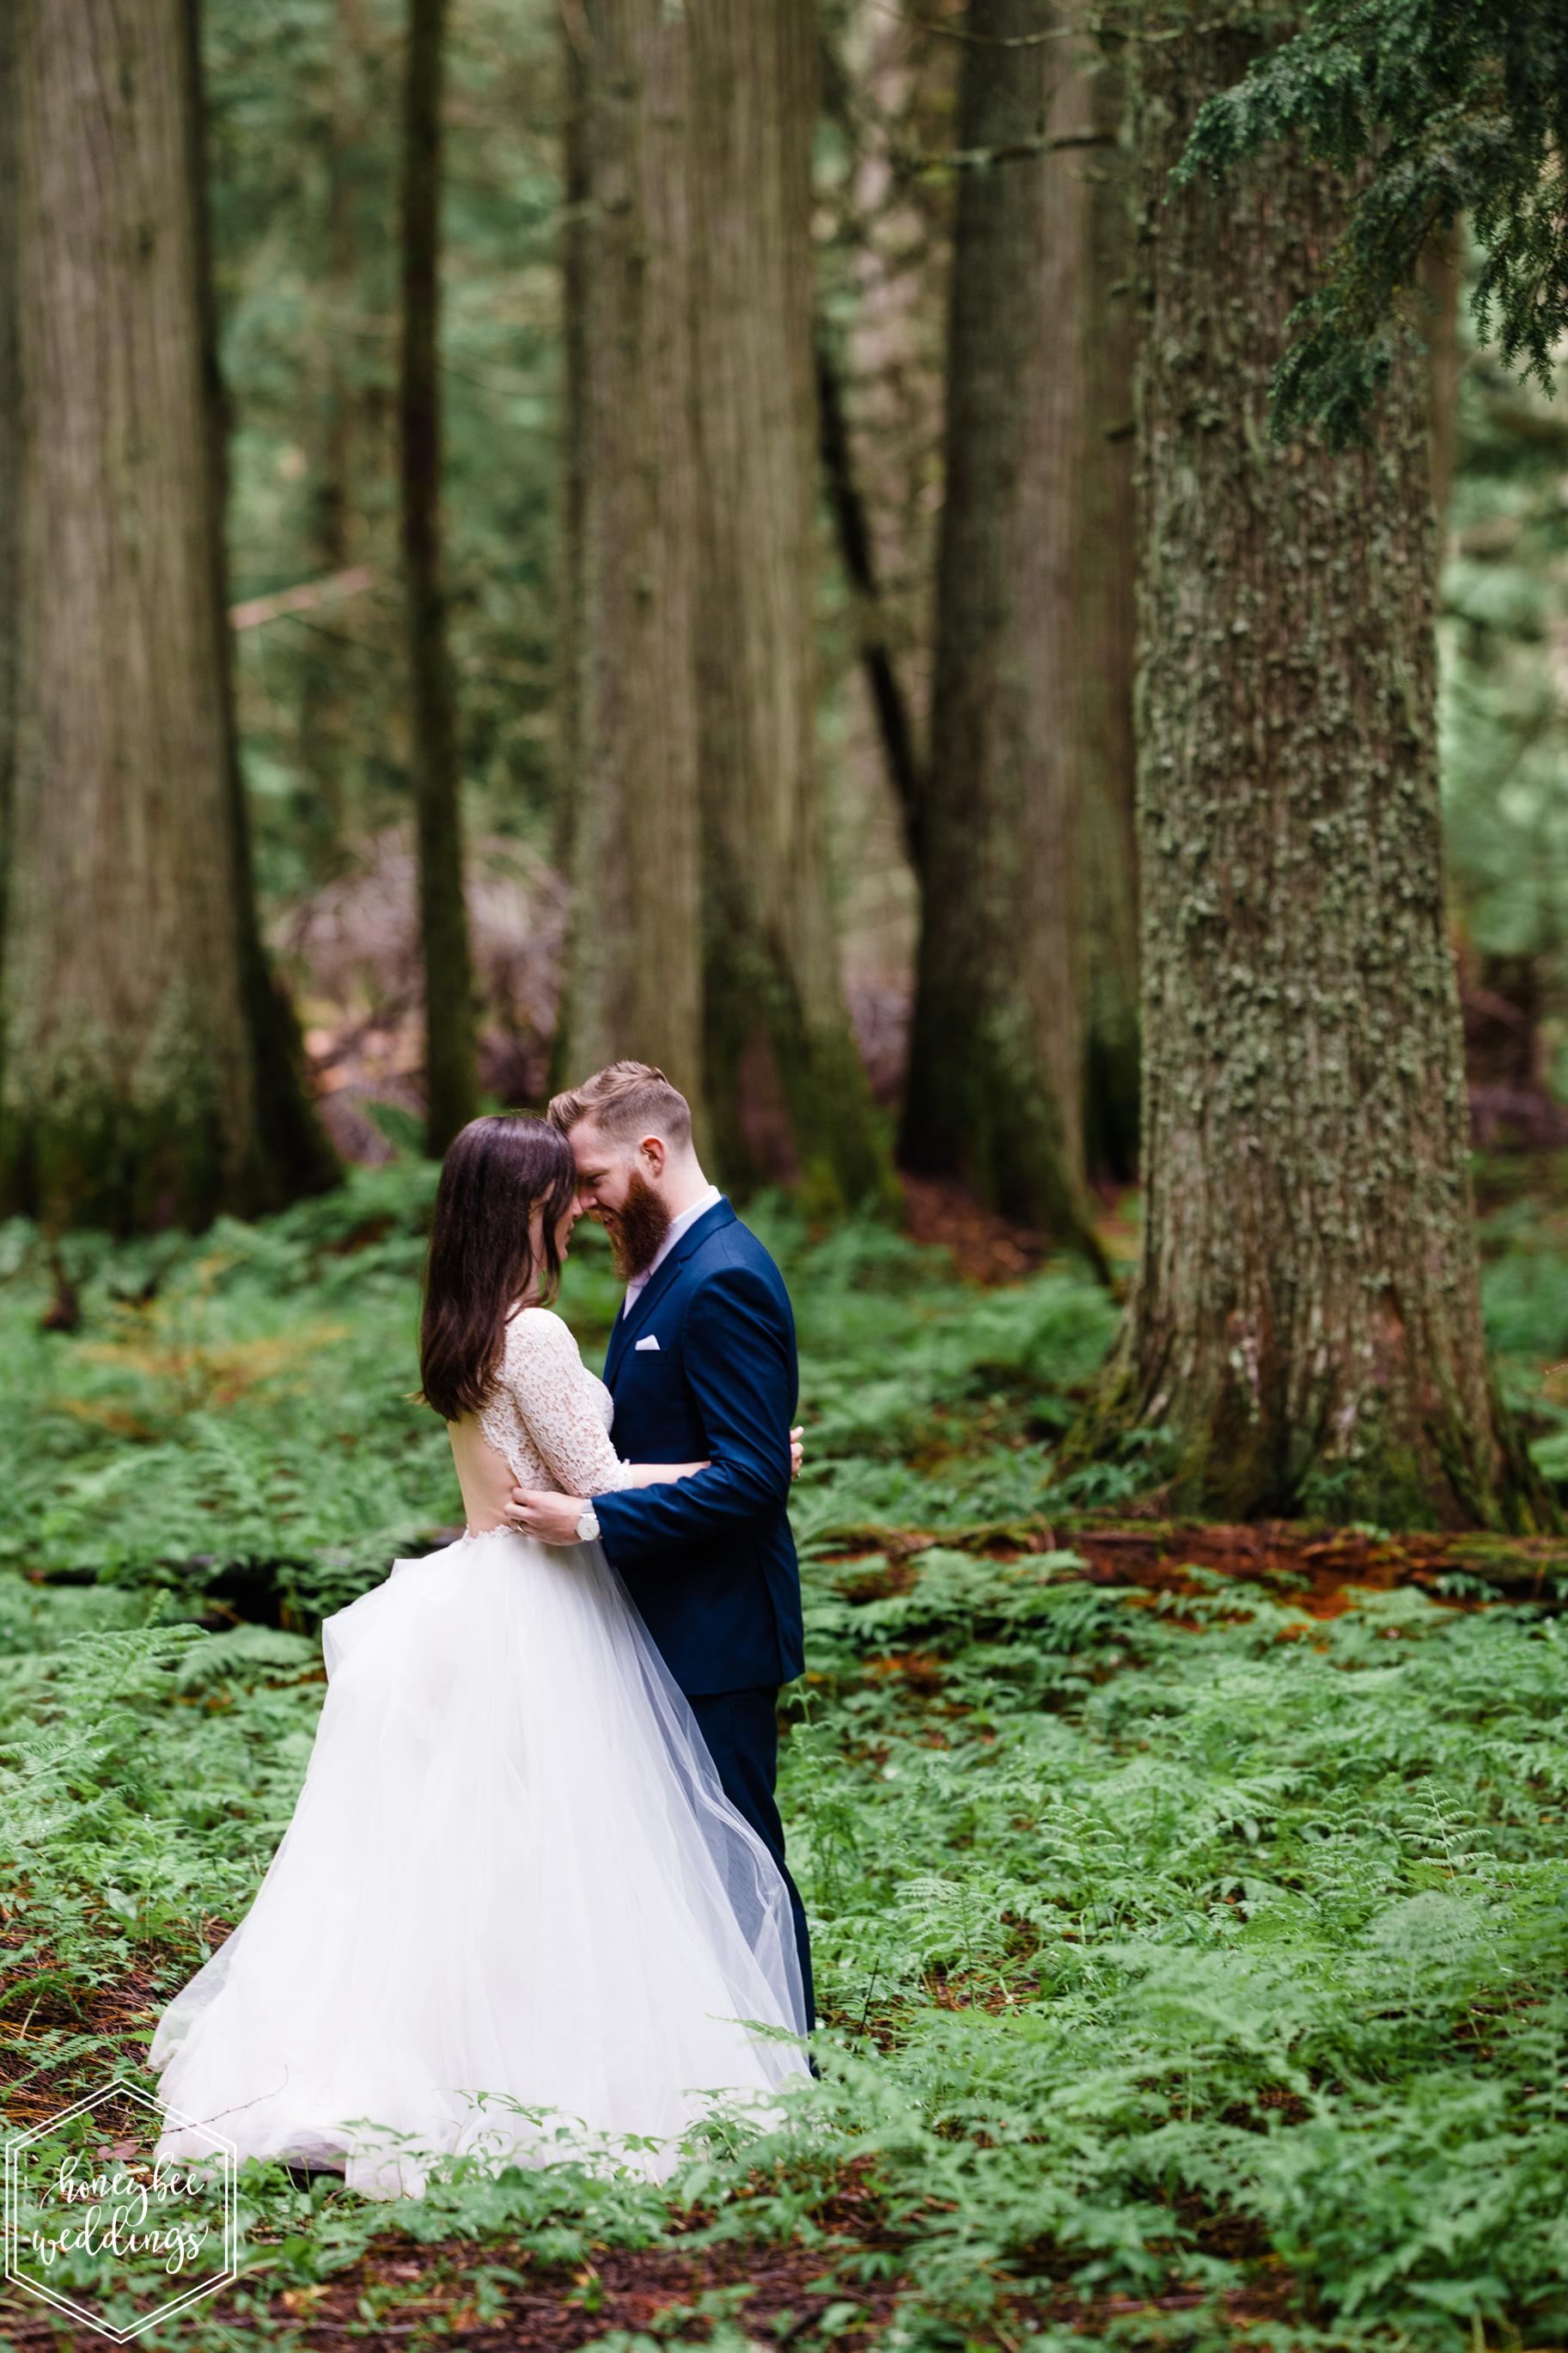 311Glacier National Park Wedding_Izaak Walton Inn Wedding_Honeybee Weddings_Norah & Kyle_June 09, 2019-146.jpg